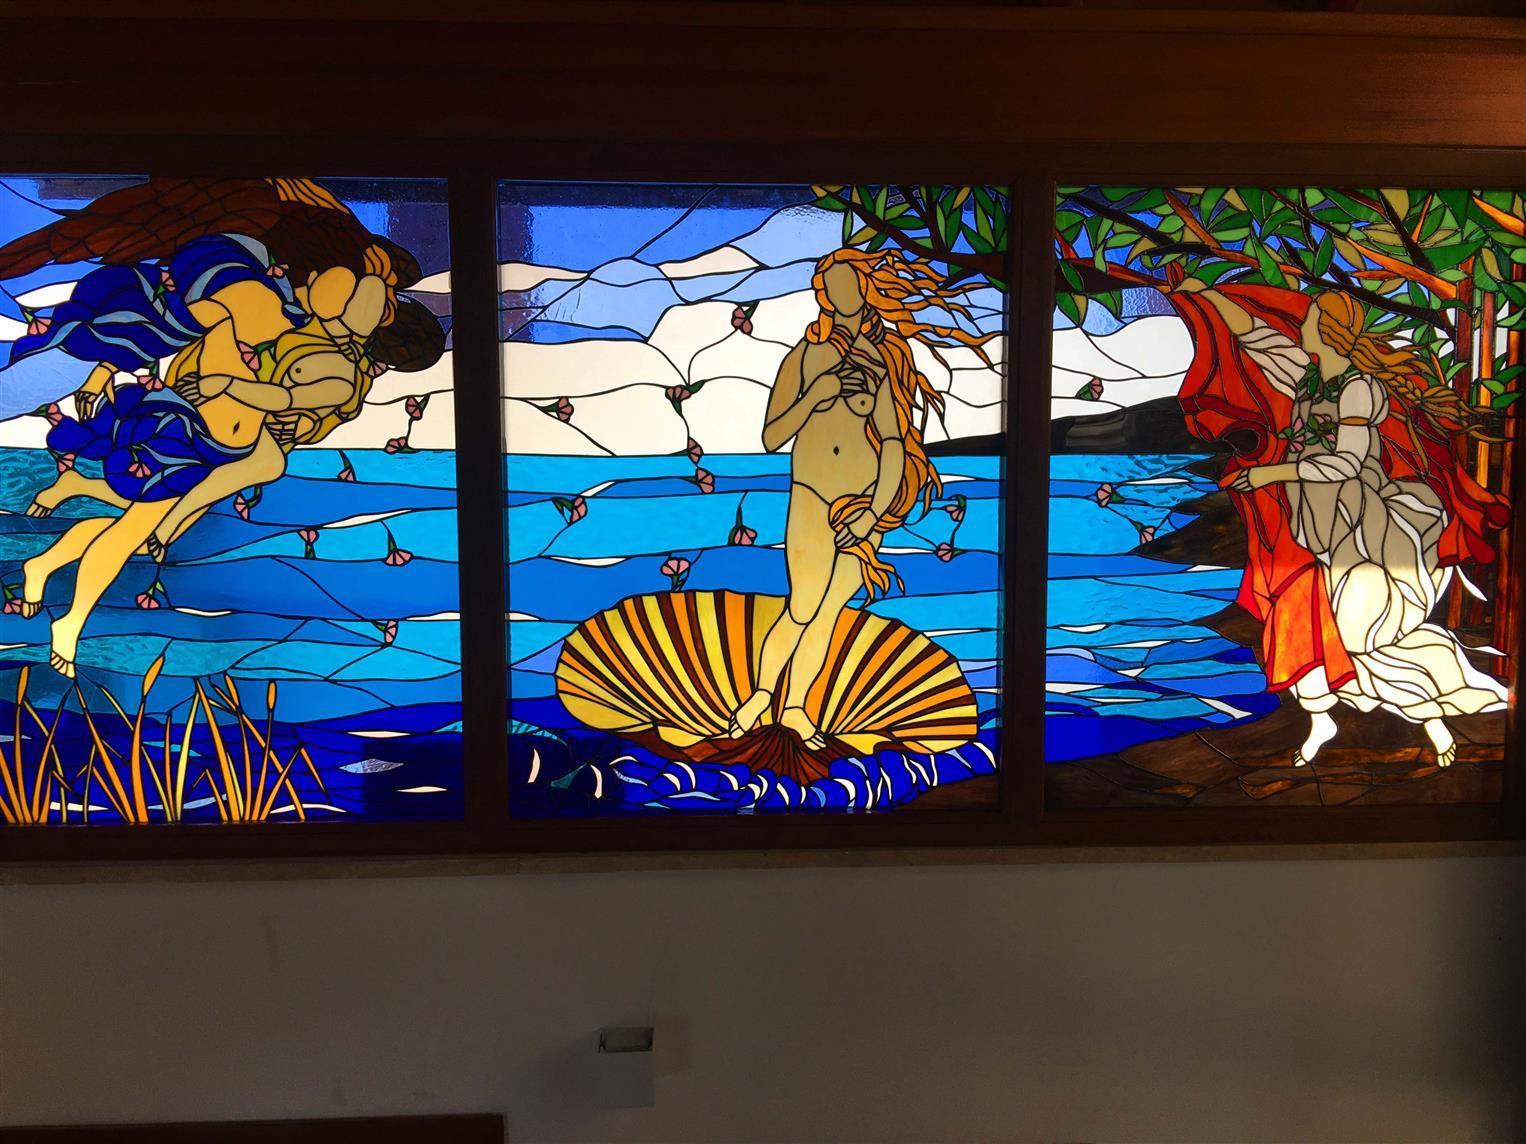 venusun-dogusu-sandro-botticelli-vitray-uyarlamasi-datca-mugla-villa2020120162230974.jpg izmir vitray çalışması